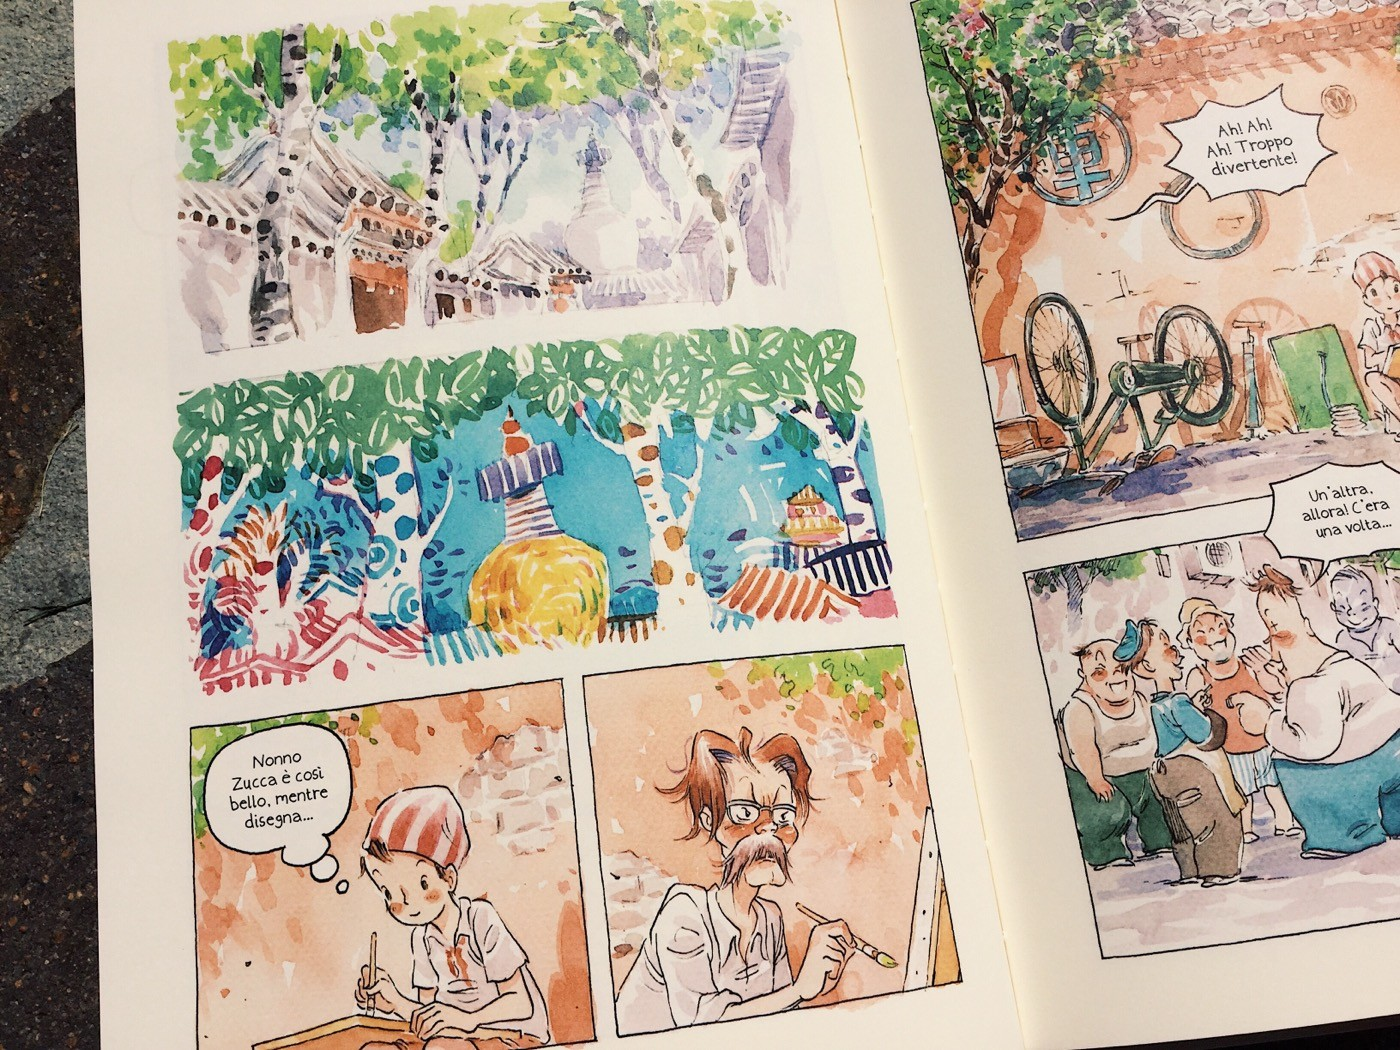 Racconti-vicoletti-Nie-Jun-Bao-Publishing